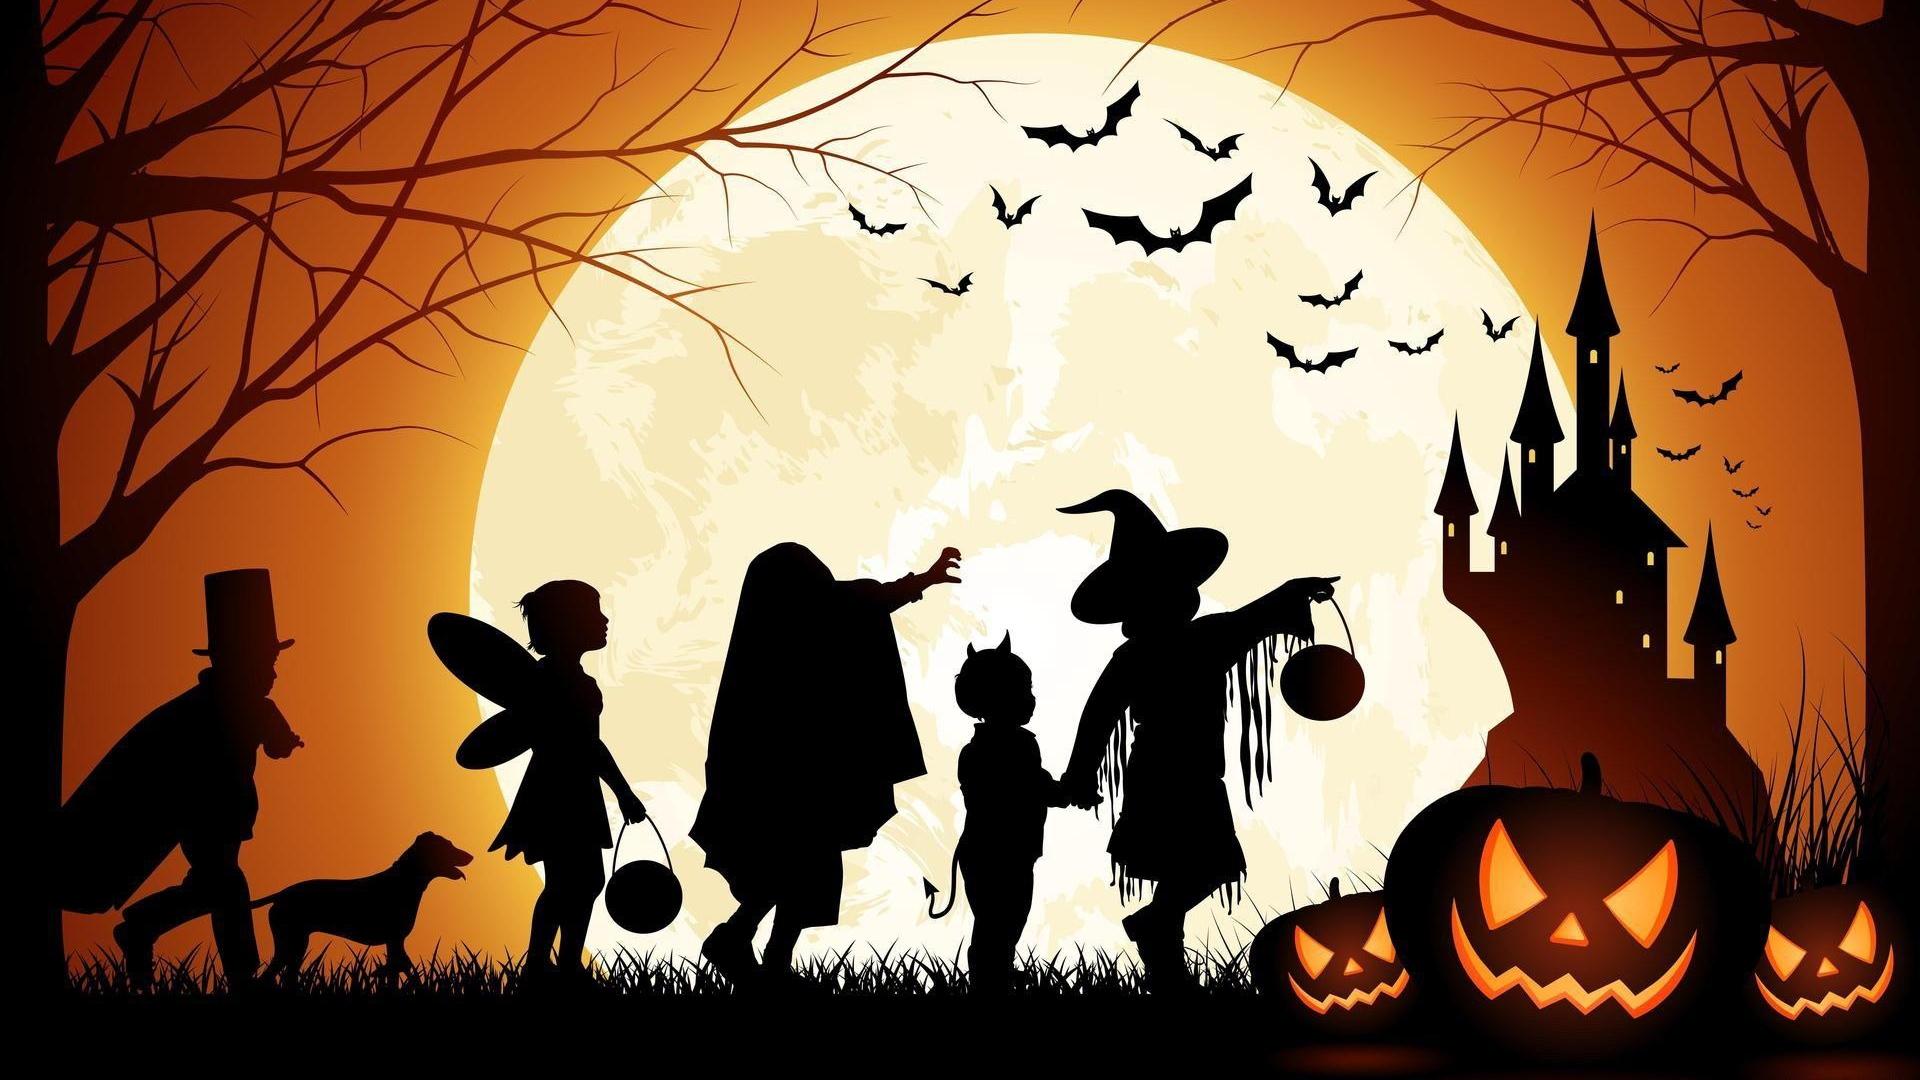 horror-halloween-wallpaper-hd